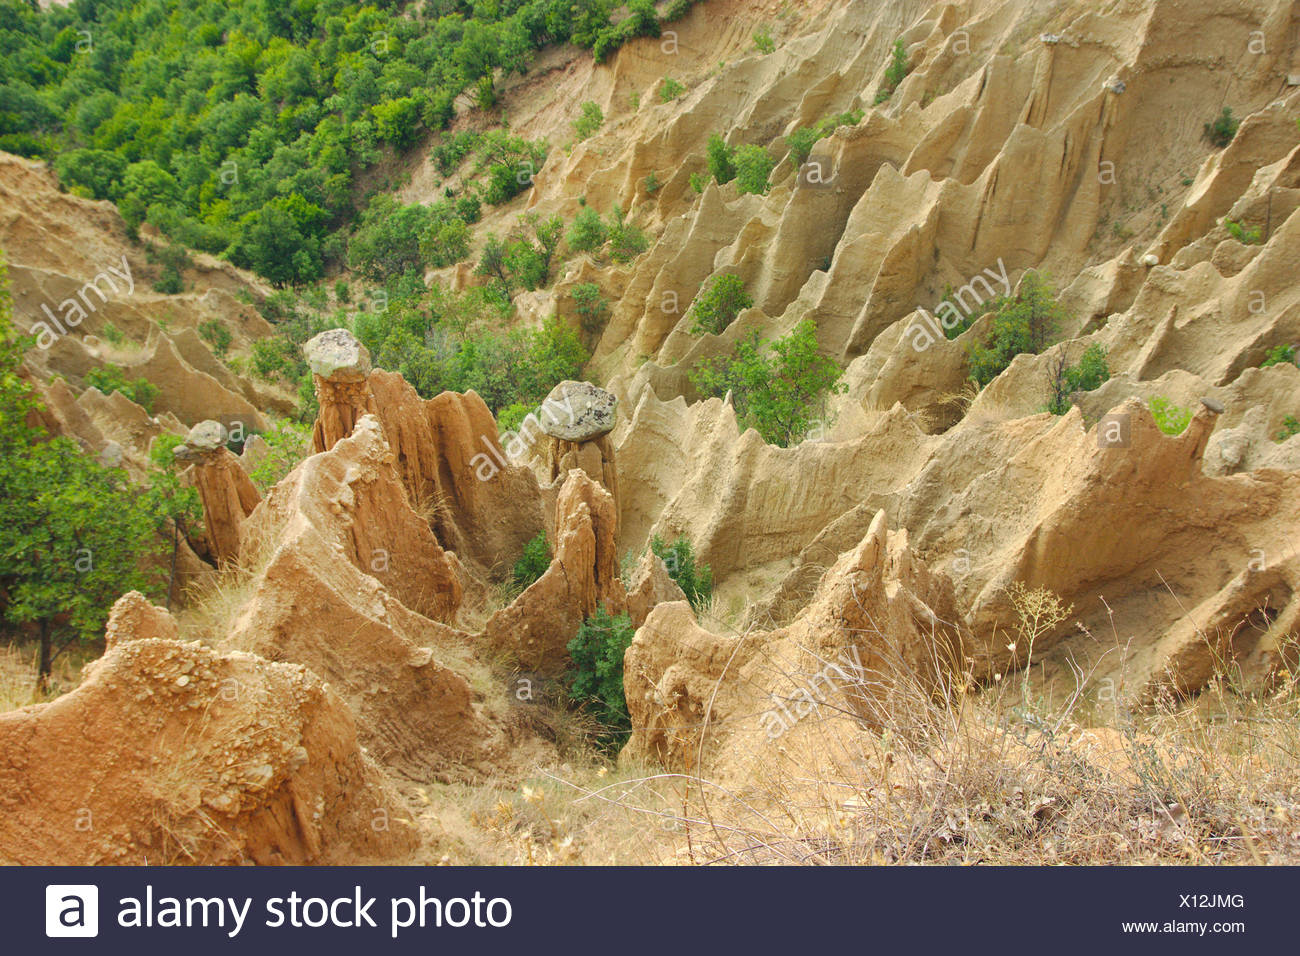 sandstone pyramids of Stob, Bulgaria, Kapatishkiya, Naturpark Rila-Kloster - Stock Image